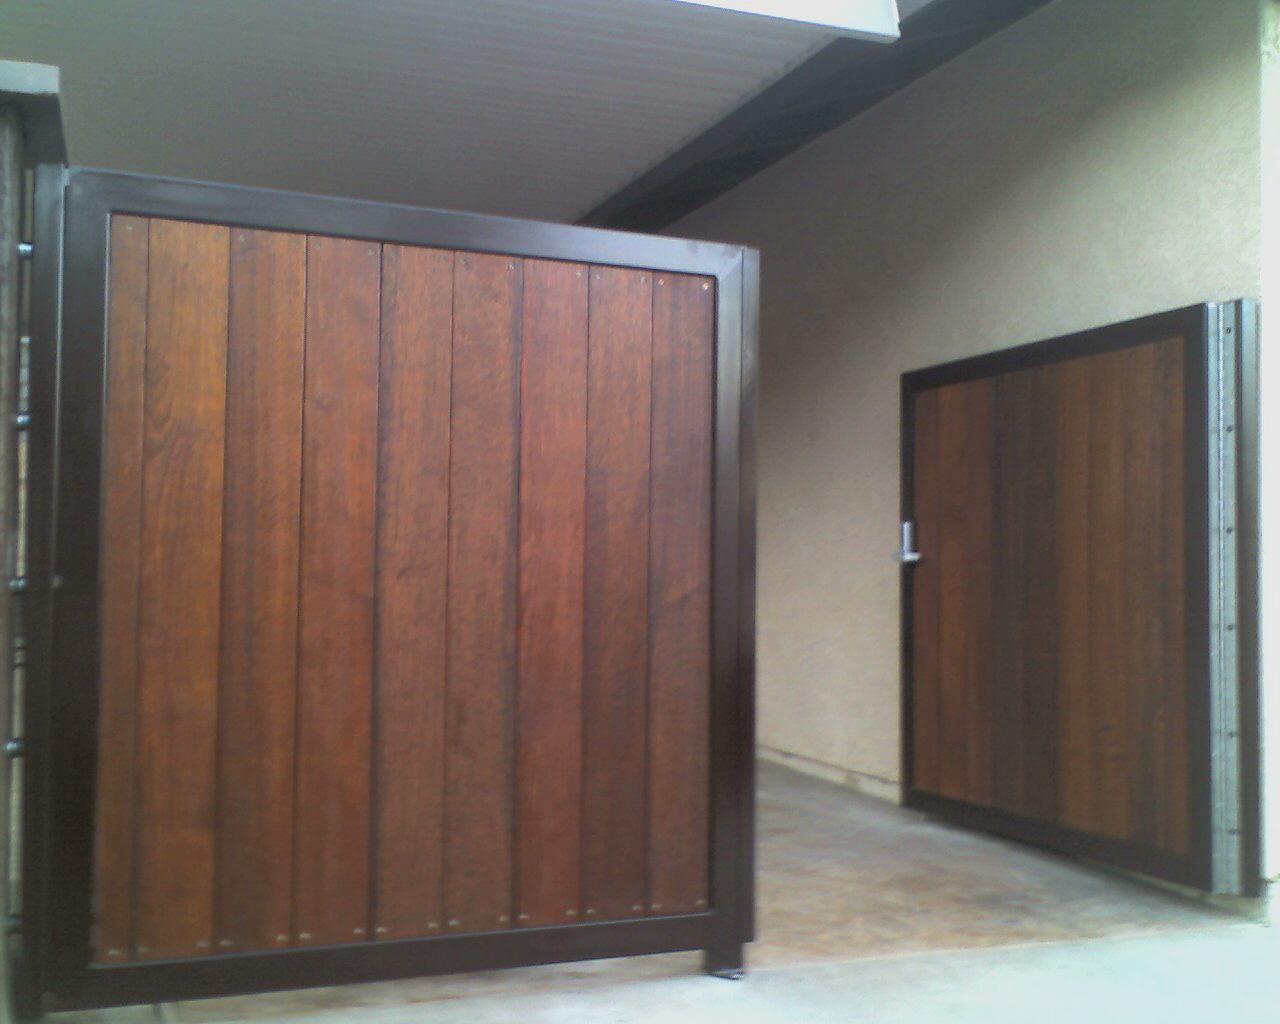 Affinity Fence Amp Gate San Diego Ca 92117 Angies List